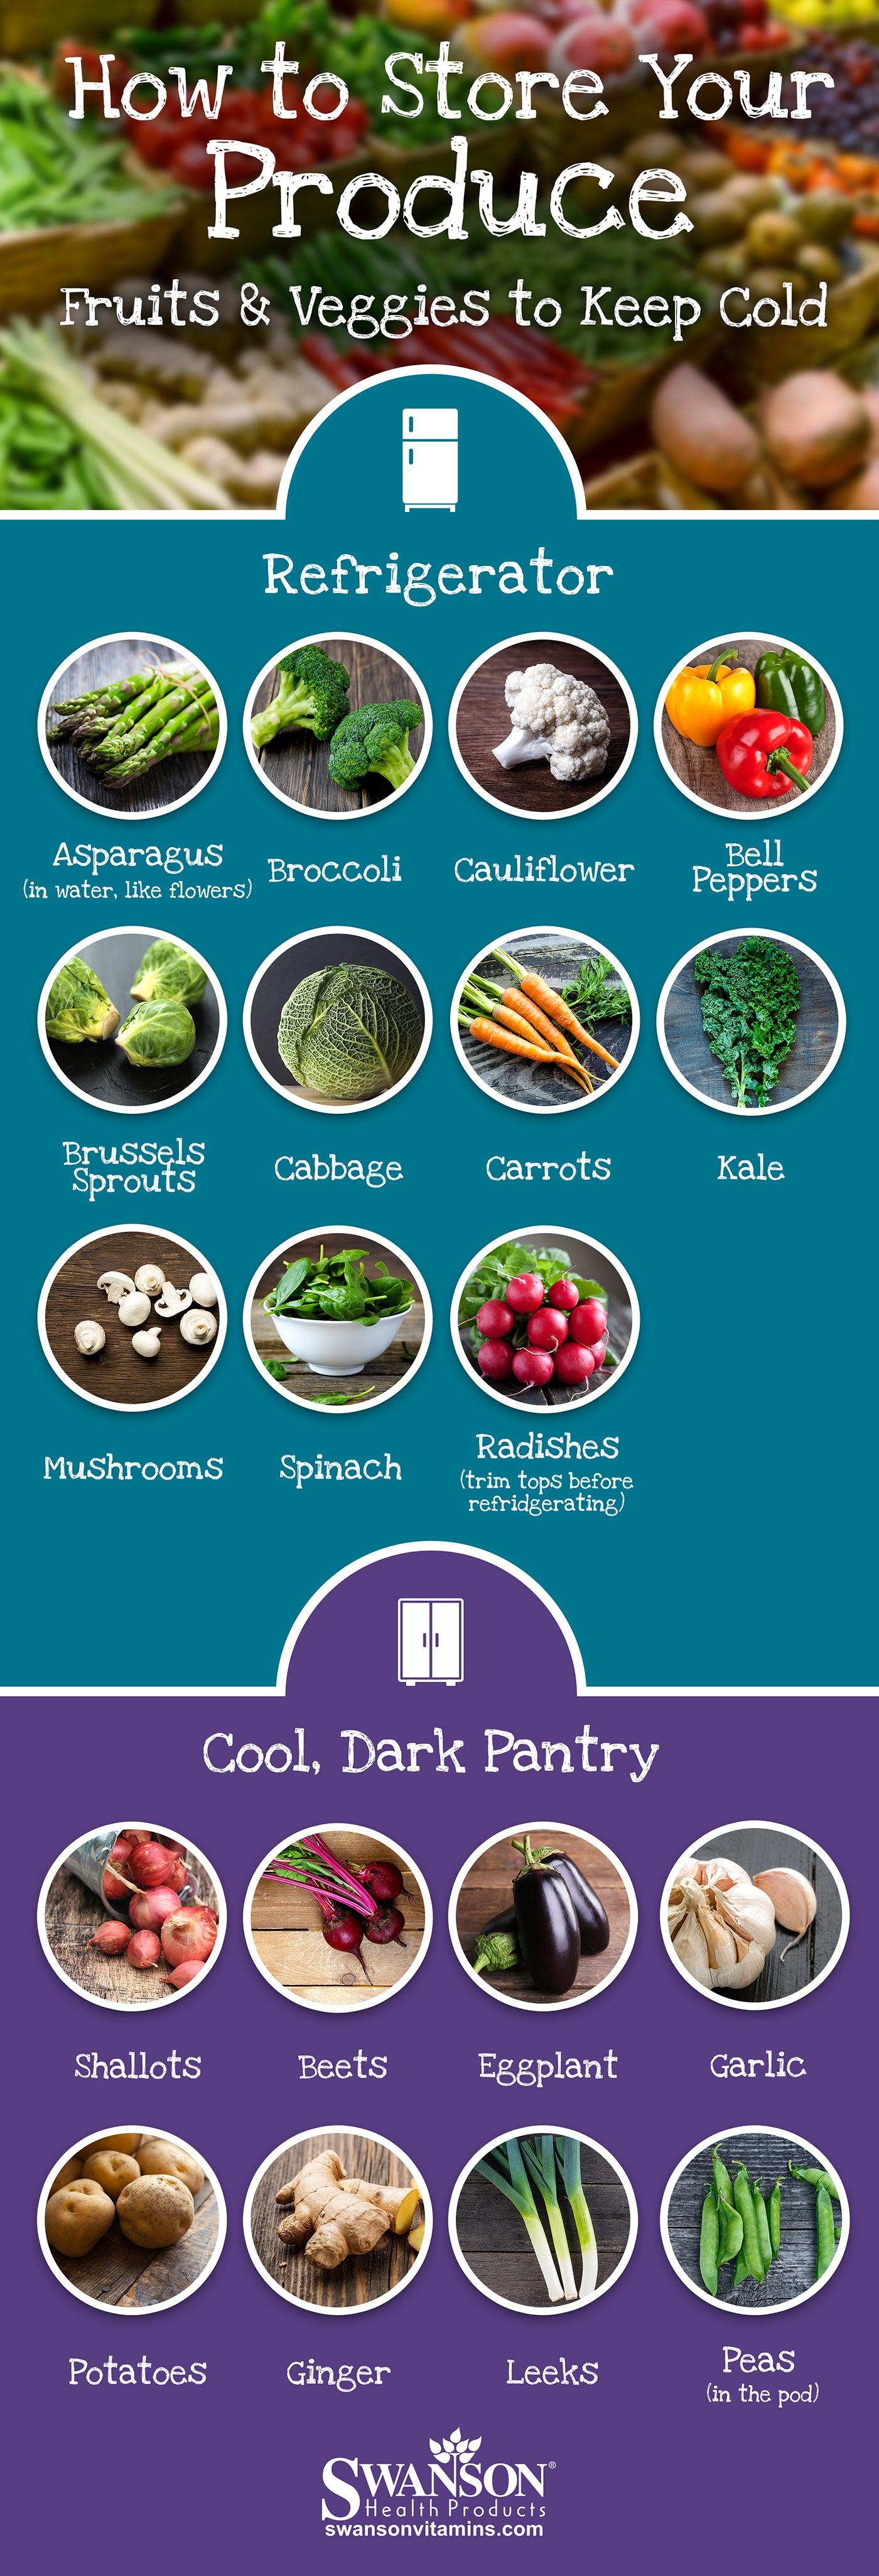 Fruits & Veggies to Keep Cold